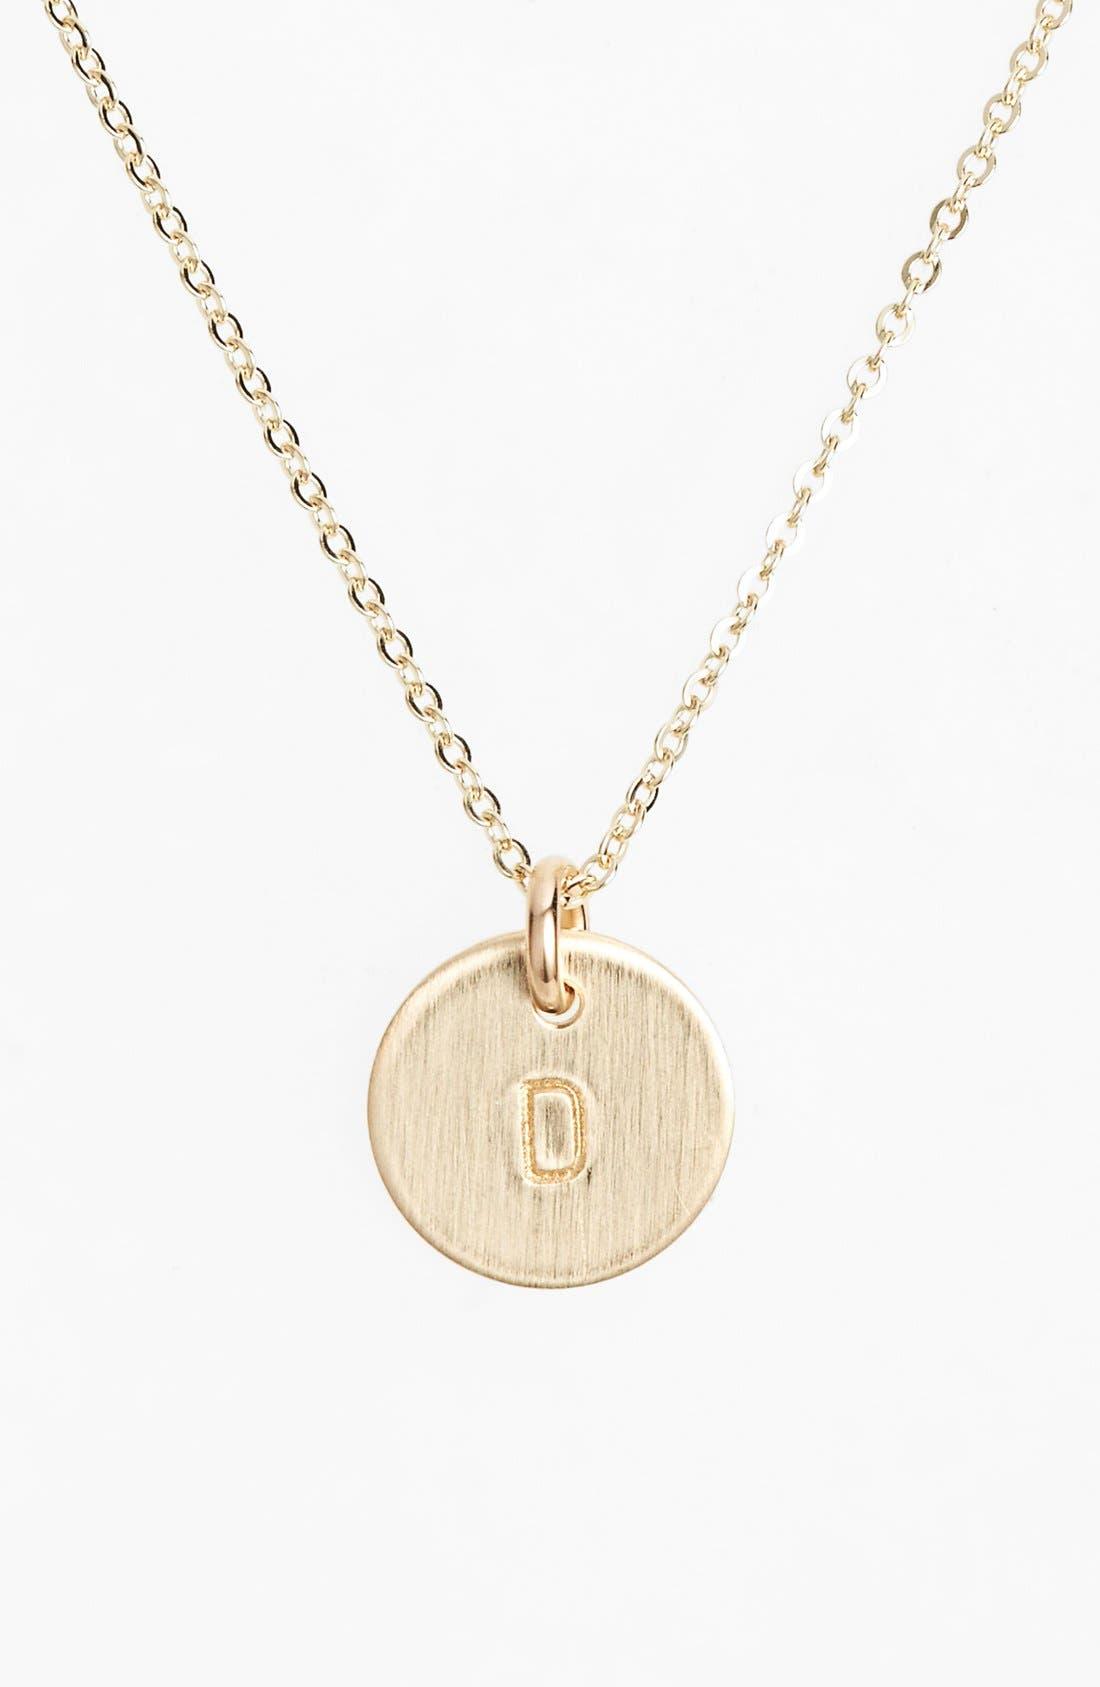 Nashelle 14k-Gold Fill Initial Mini Circle Necklace